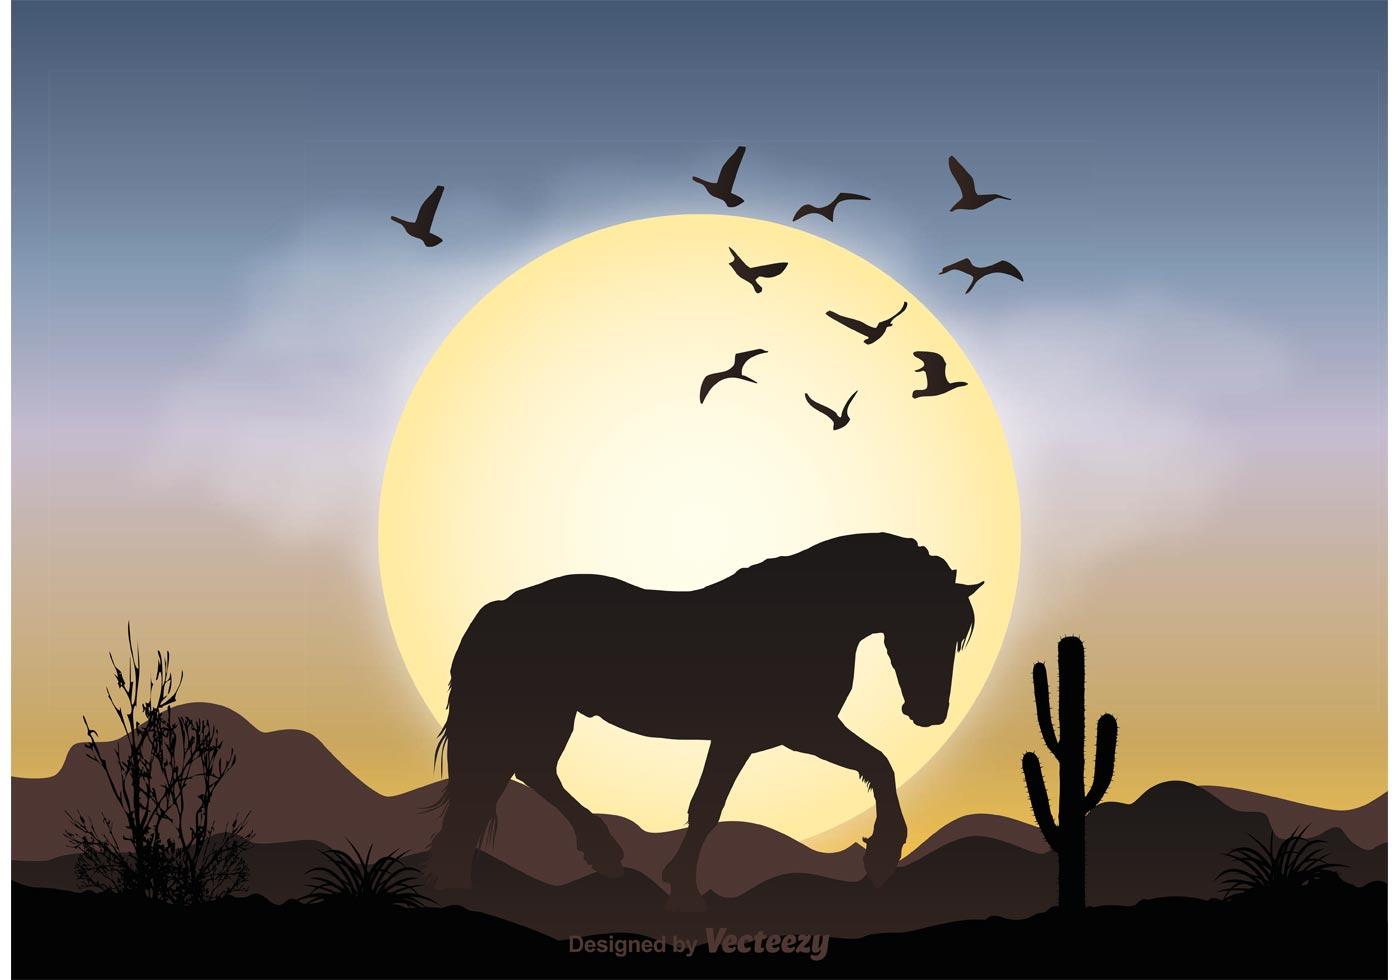 Landscape Illustration Vector Free: Wild Horse Landscape Illustration